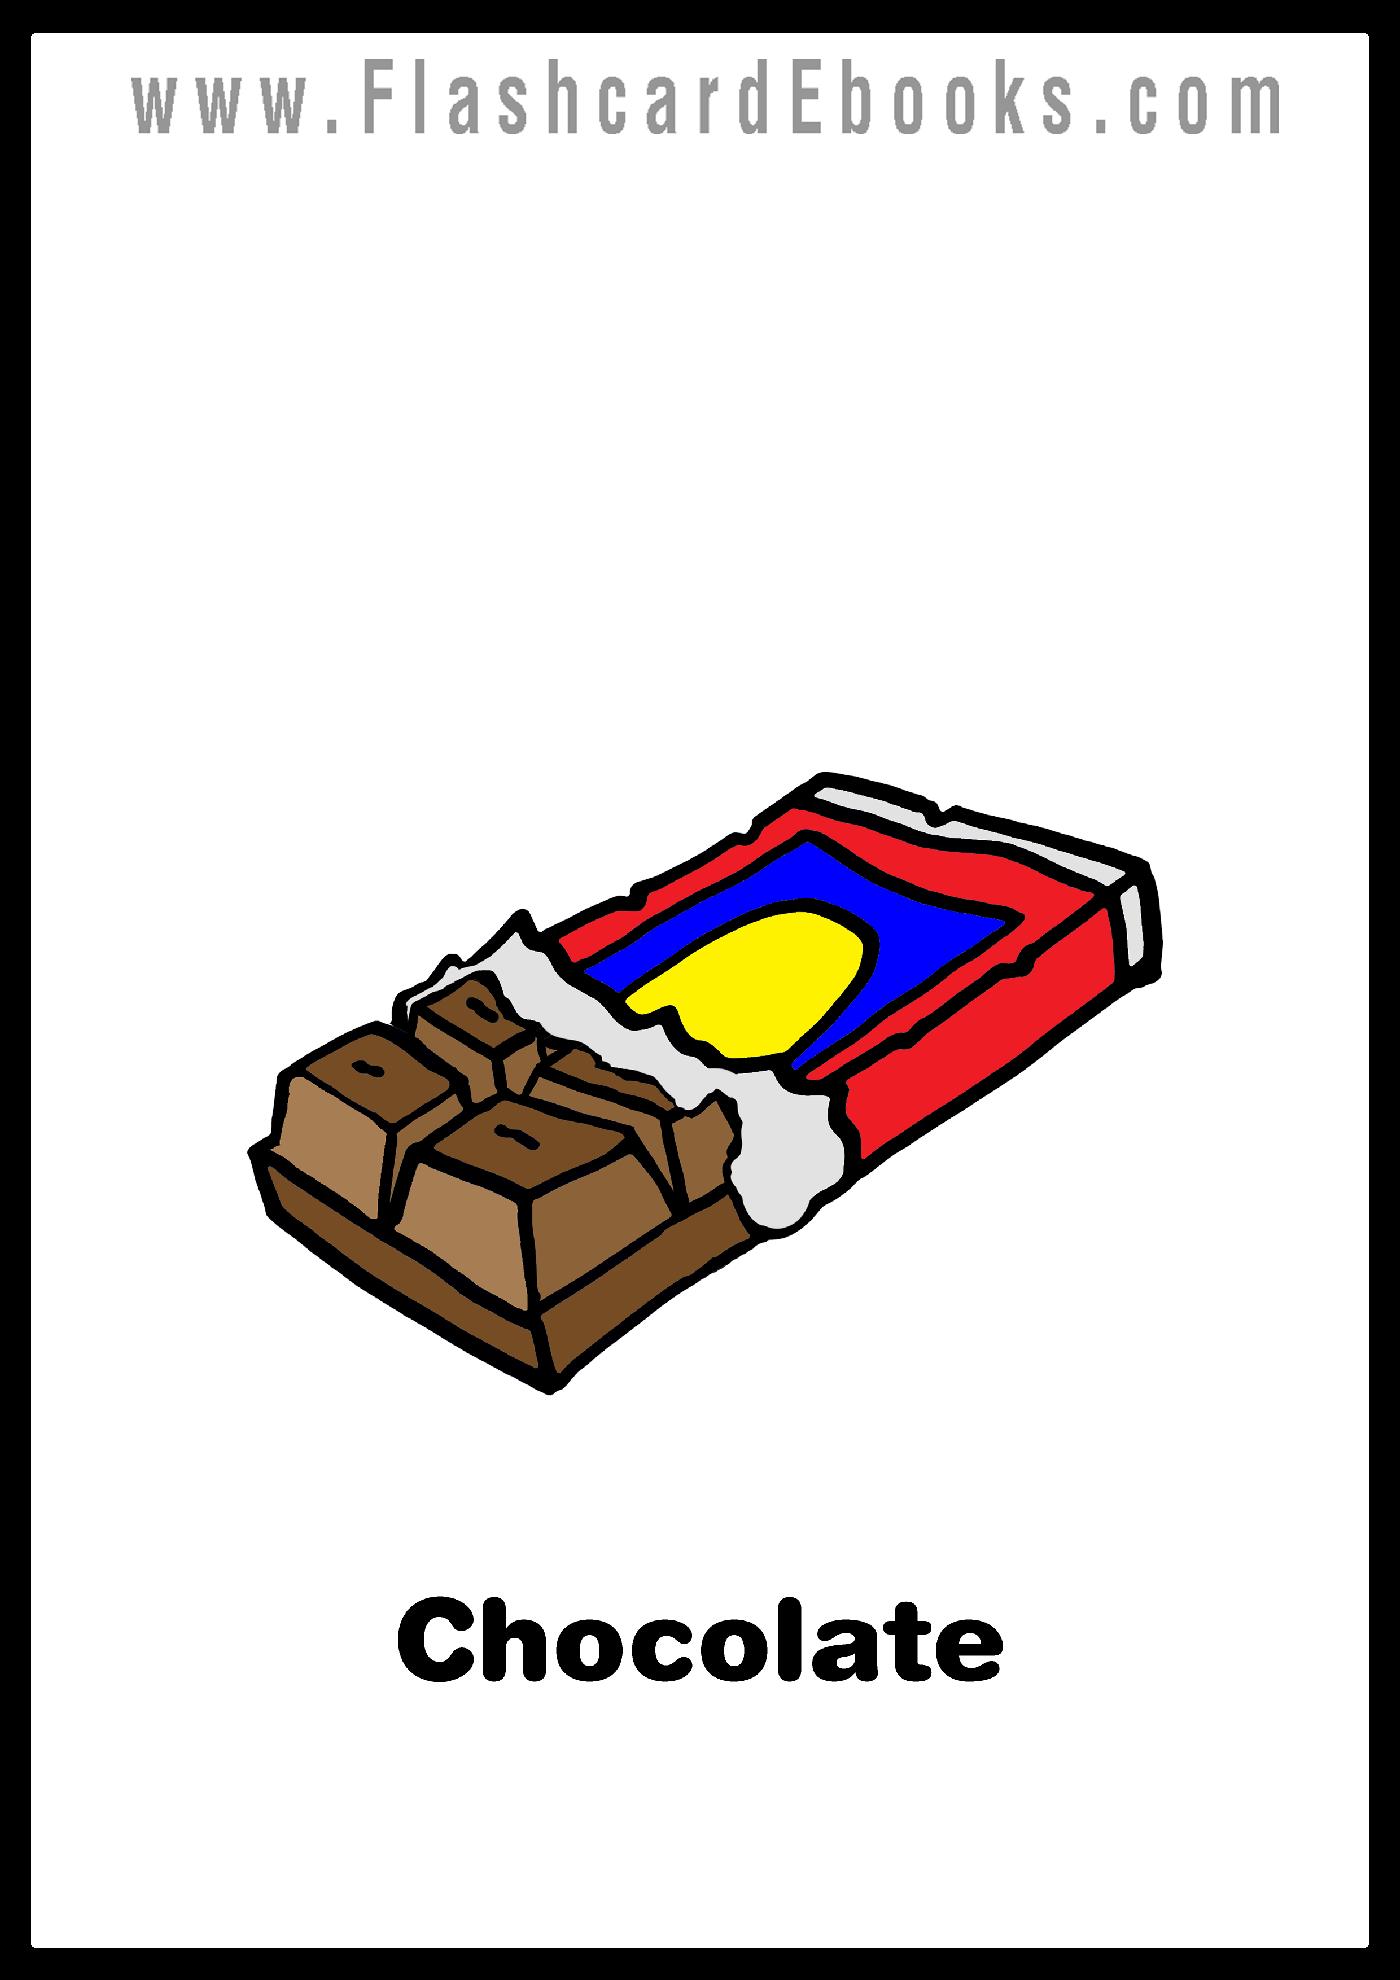 English Flashcard Kindle Chocolate